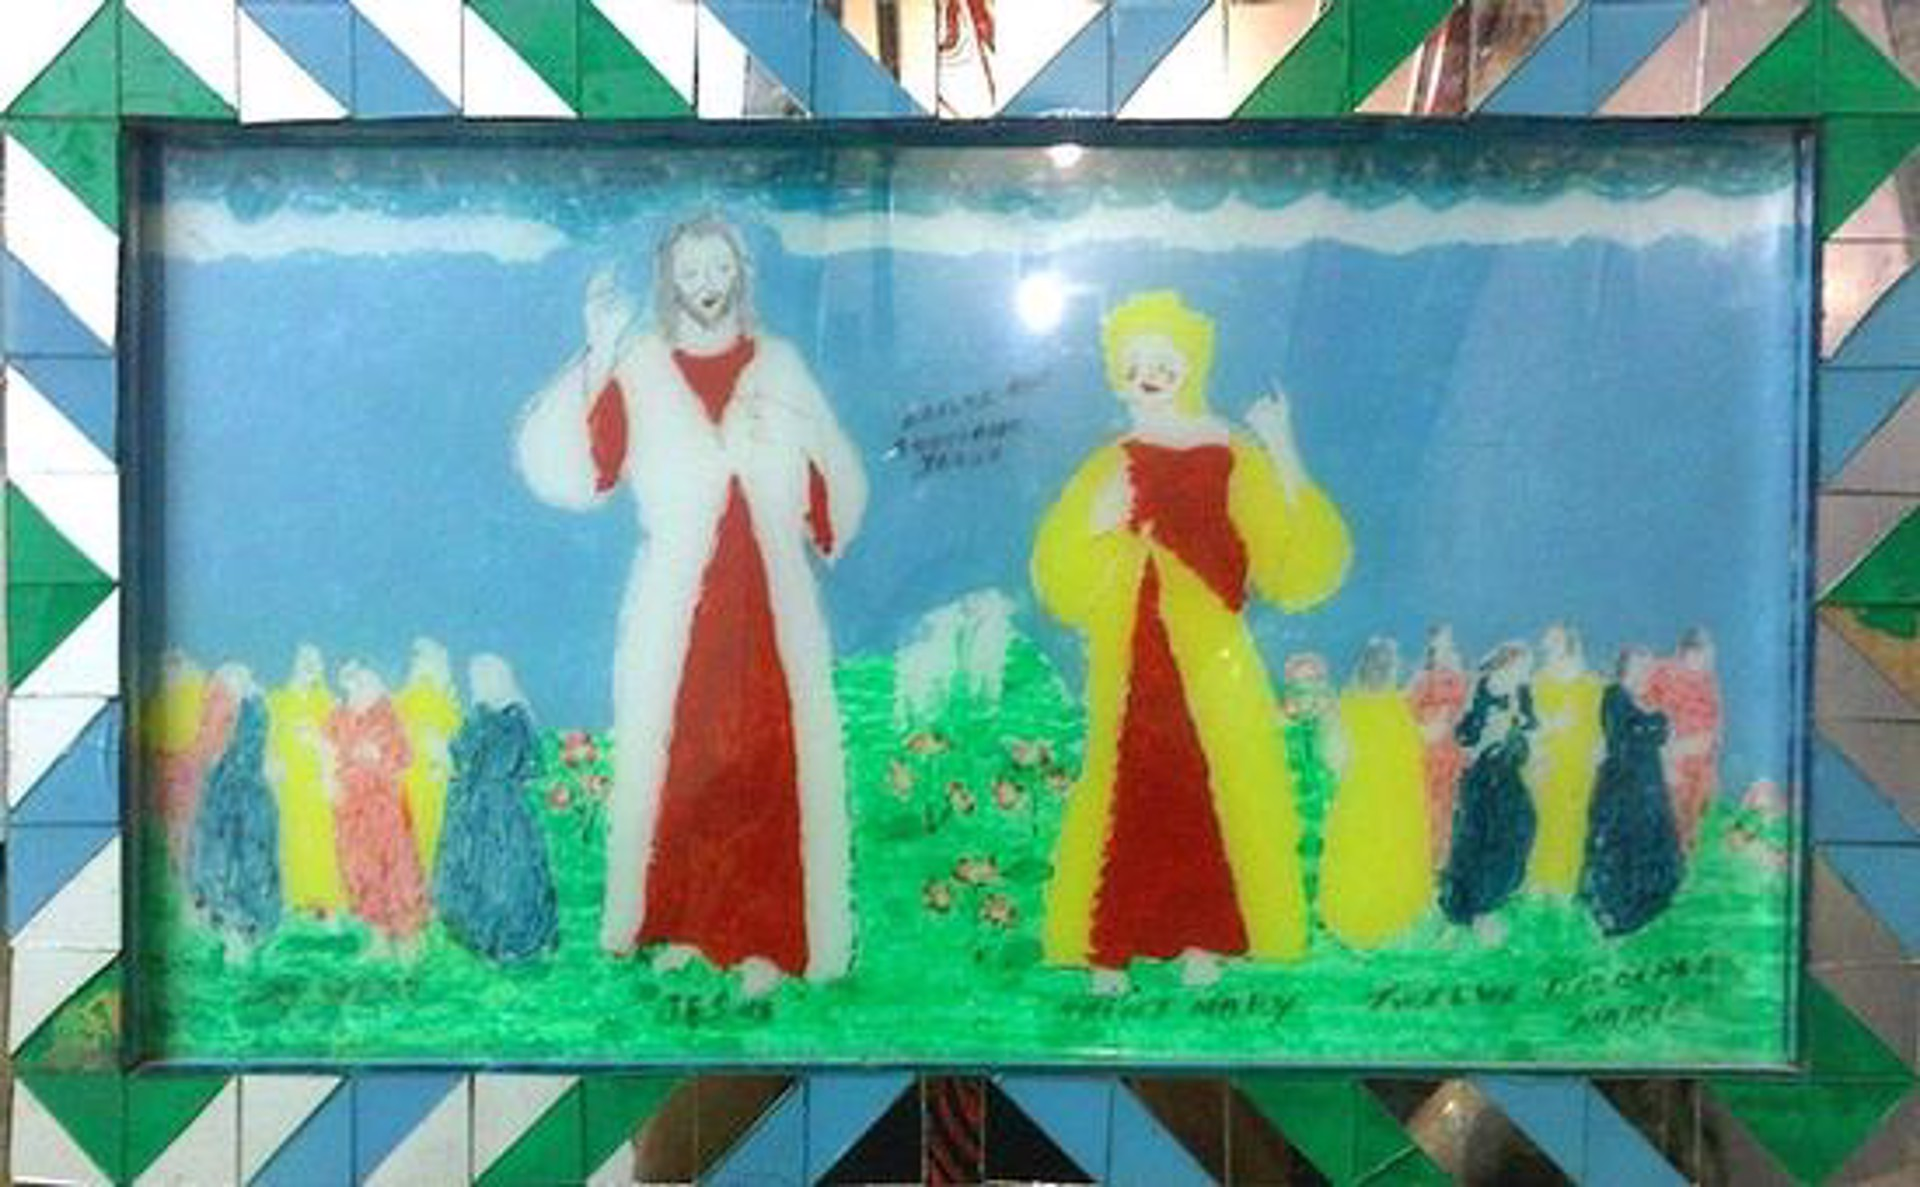 Jesus, Saint Mary and The Disciples by Makiki aka Geraldo Alfonso